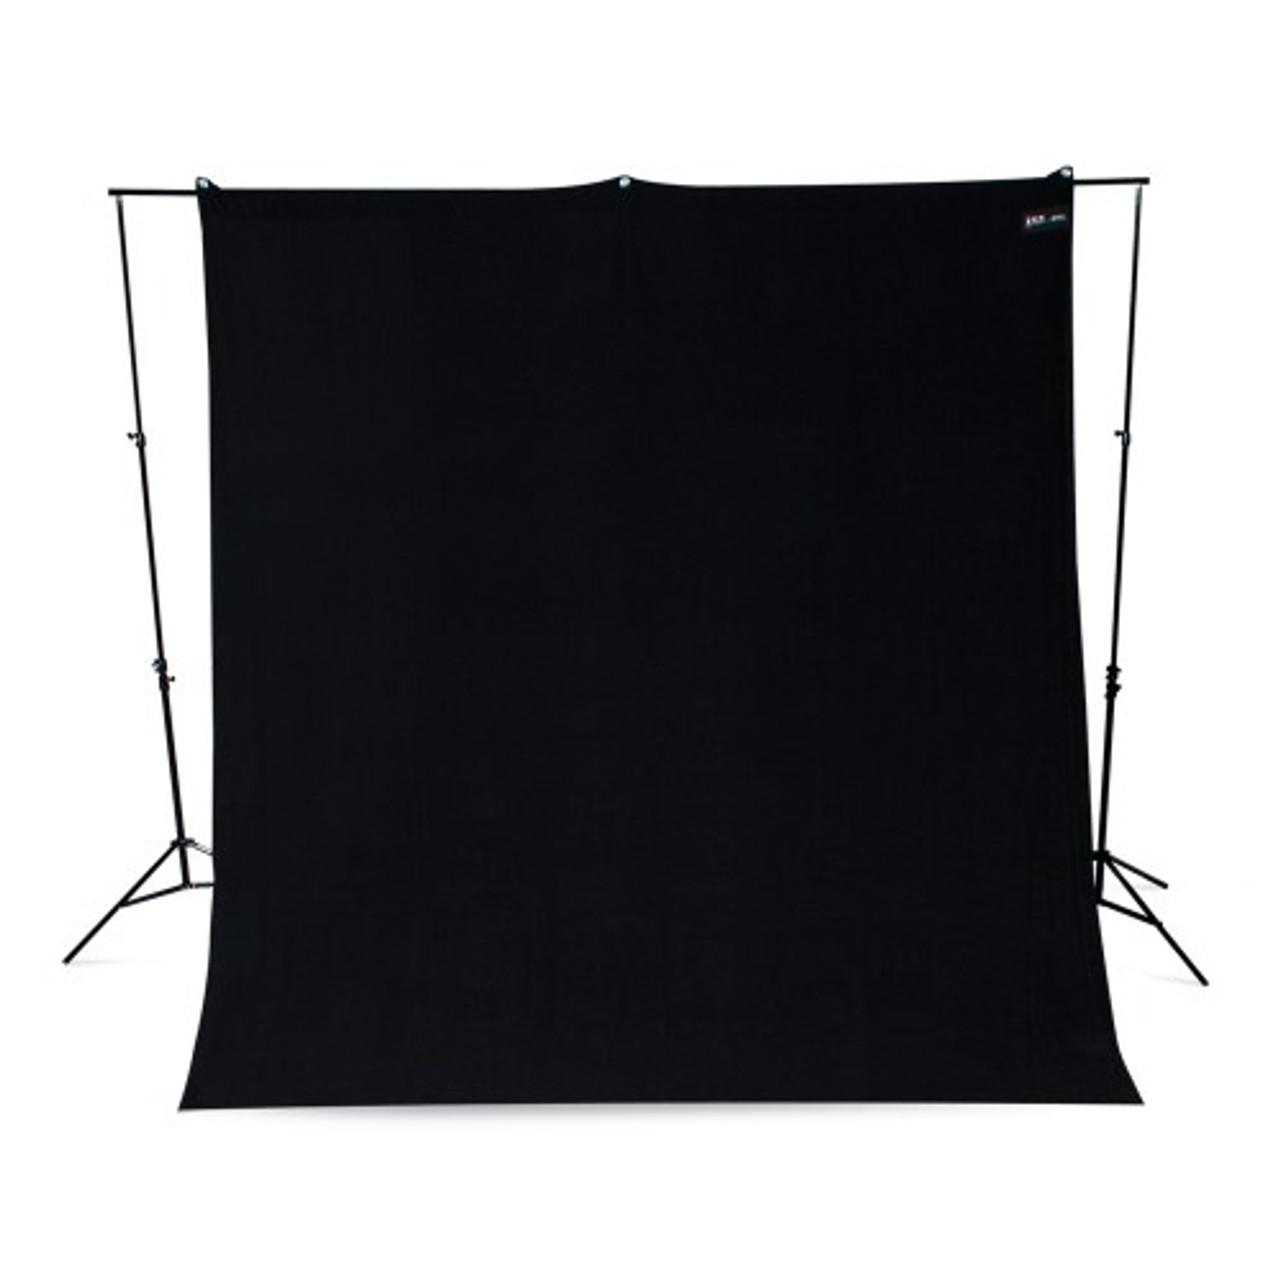 Westcott Photo Basics Backdrop (9'x10') - Black #133